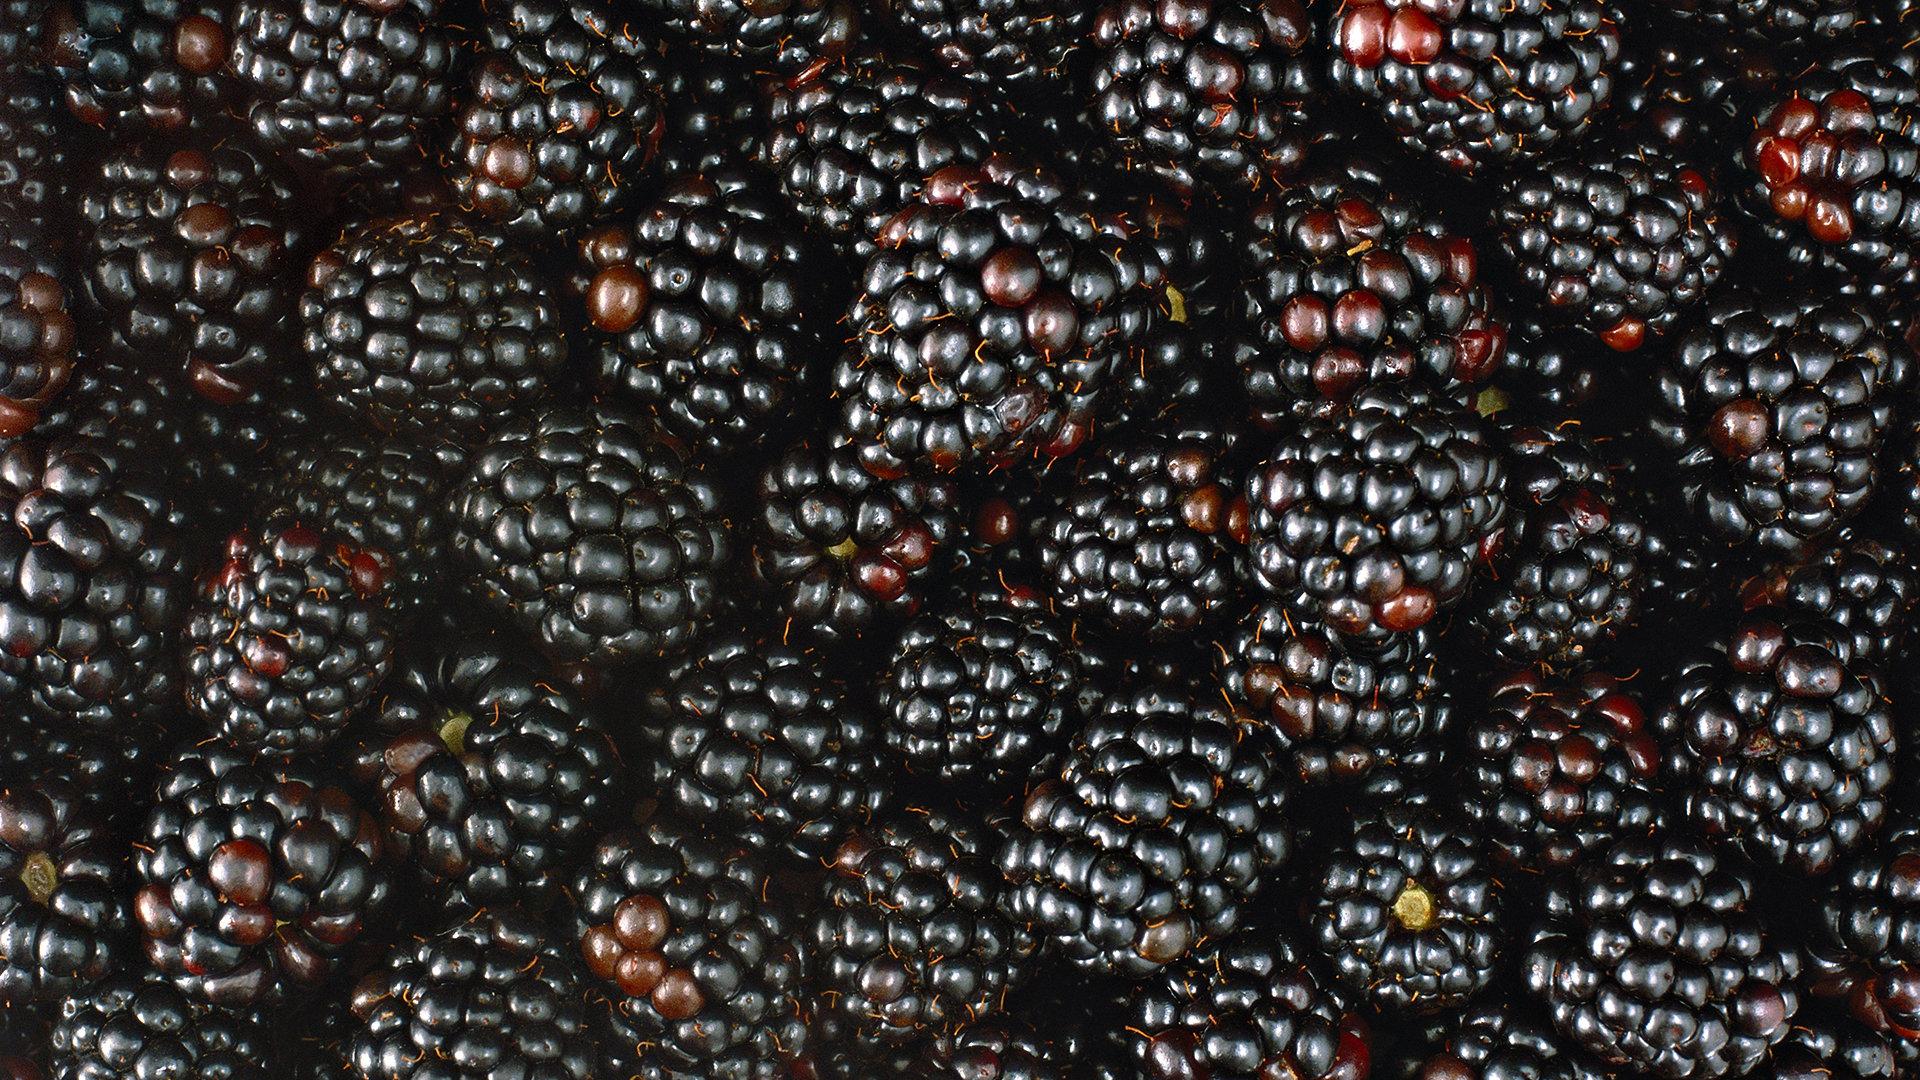 Best Blackberry Wallpaper ID387395 For High Resolution Full Hd 1080p Computer